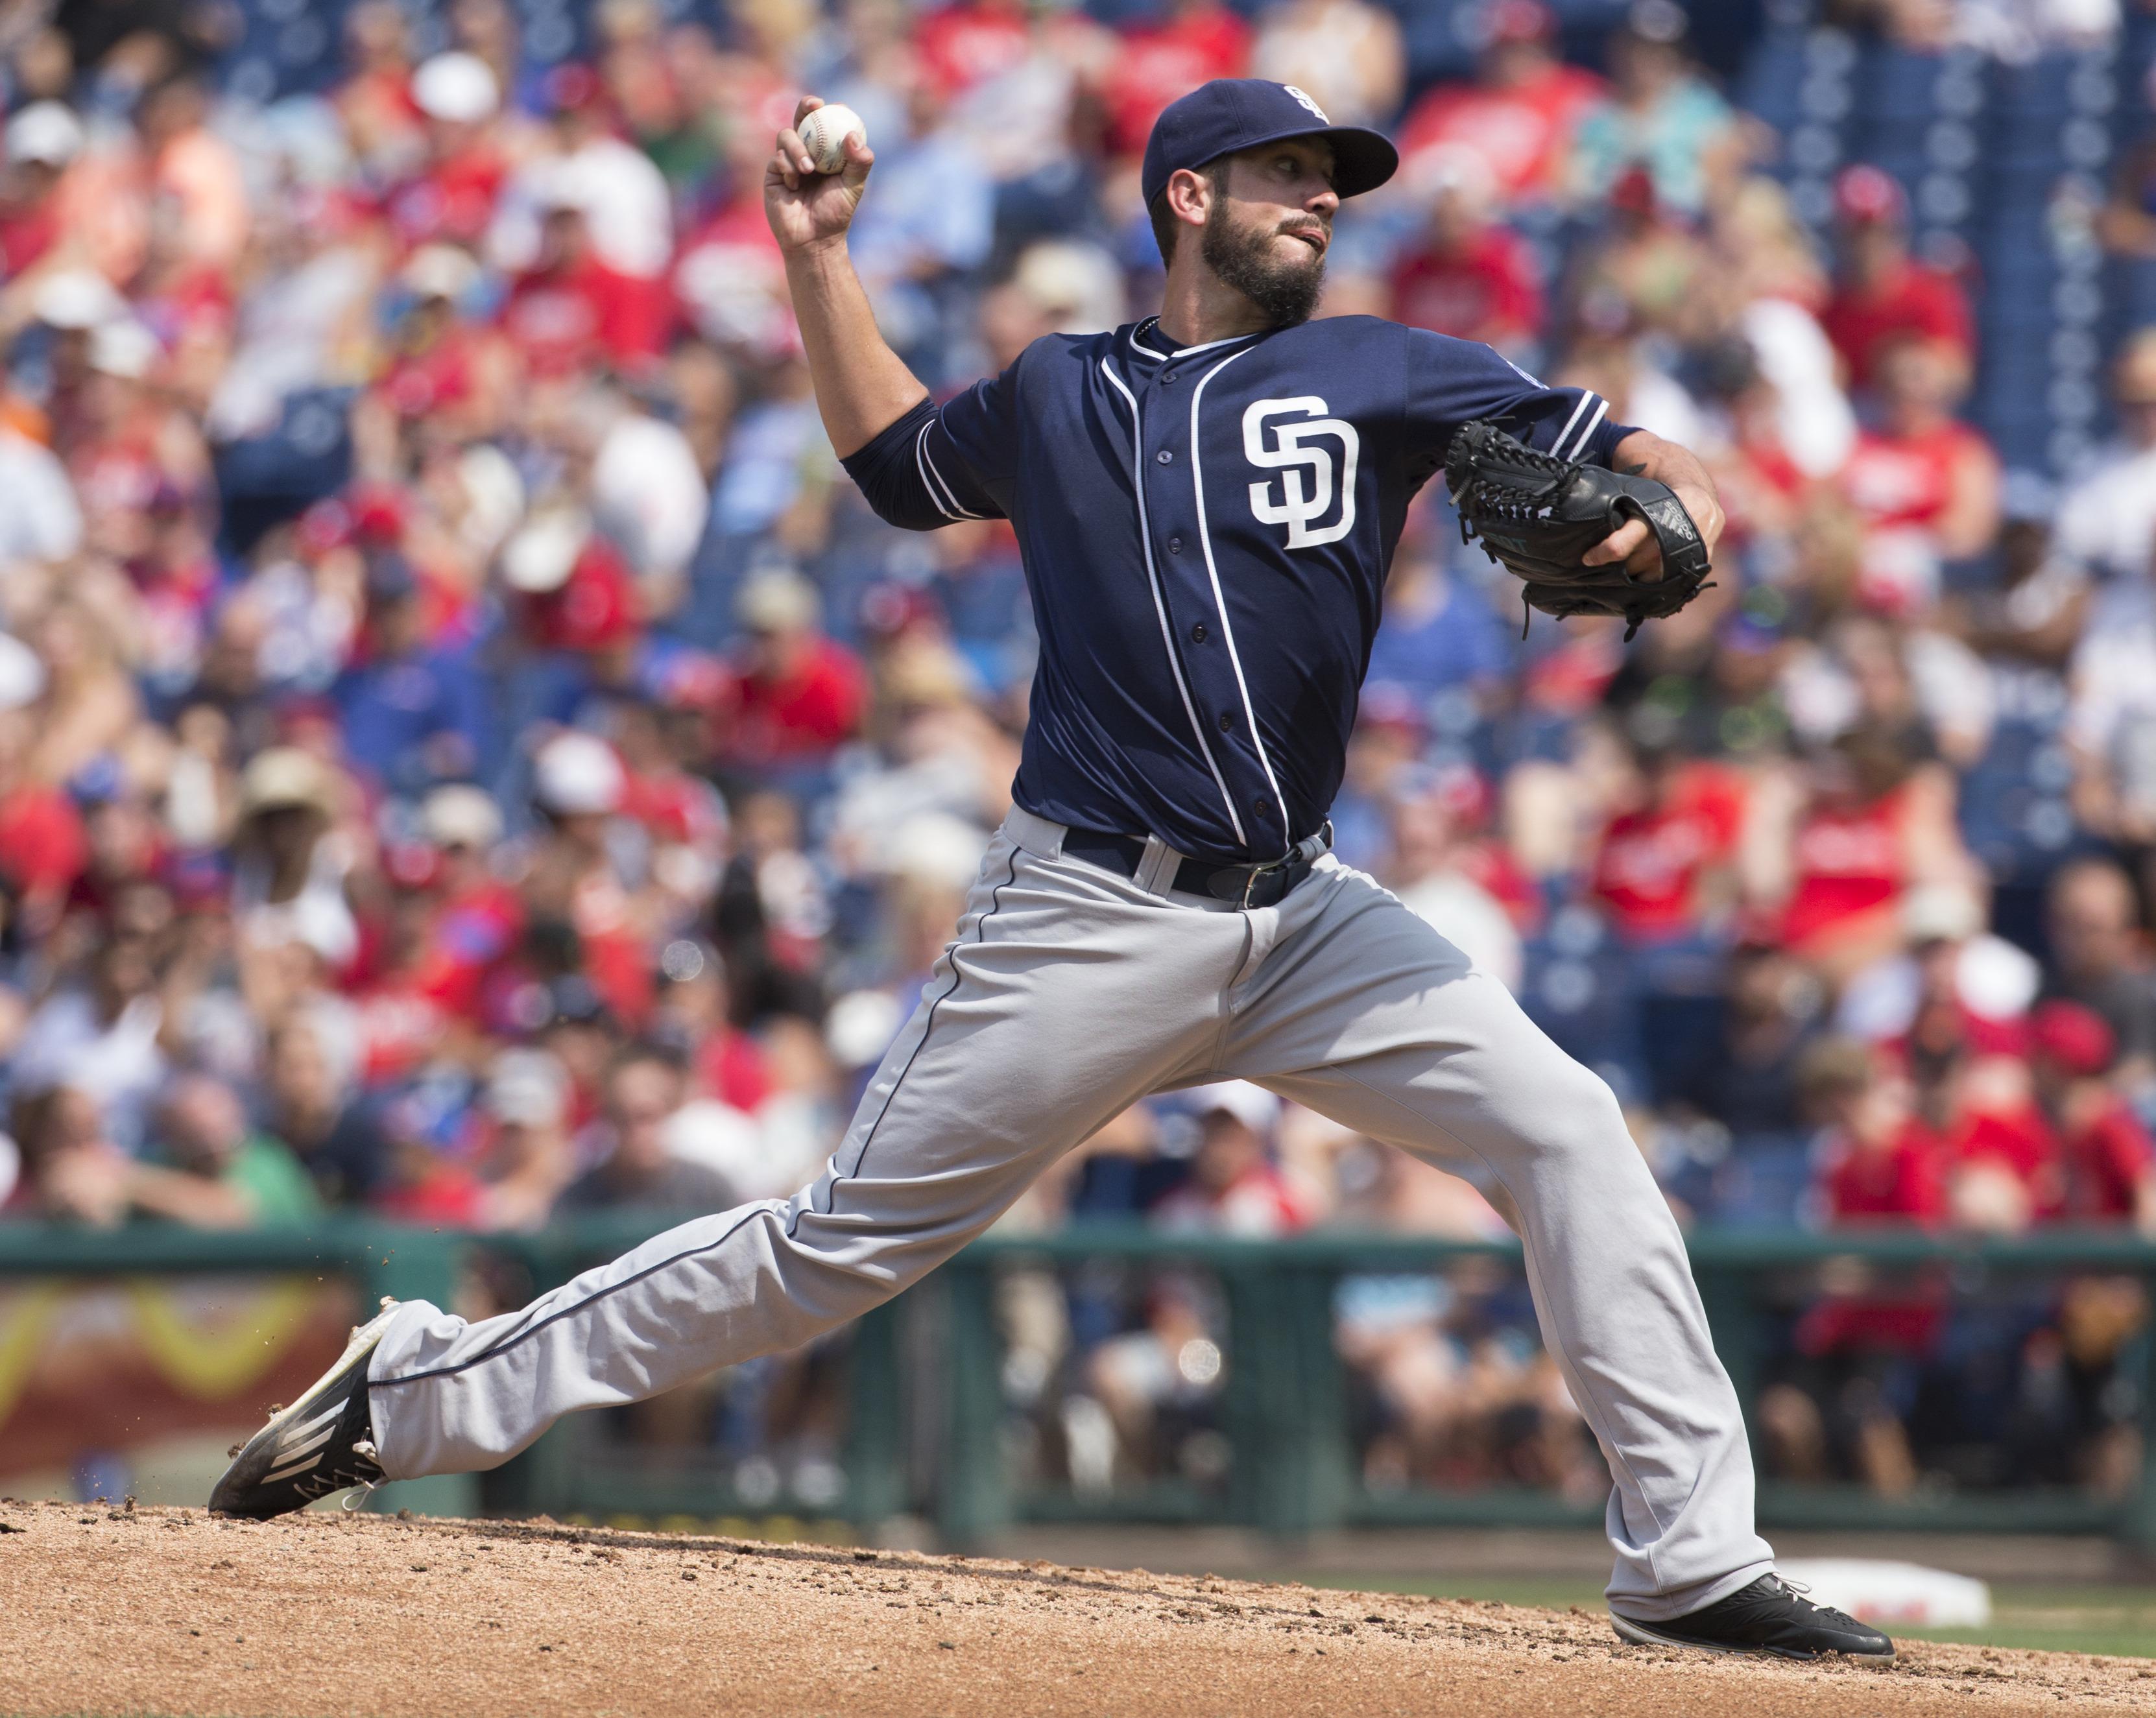 San Diego Padres starting pitcher James Shields throws during the third inning of a baseball game against the Philadelphia Phillies, Sunday, Aug. 30, 2015, in Philadelphia. (AP Photo/Chris Szagola)